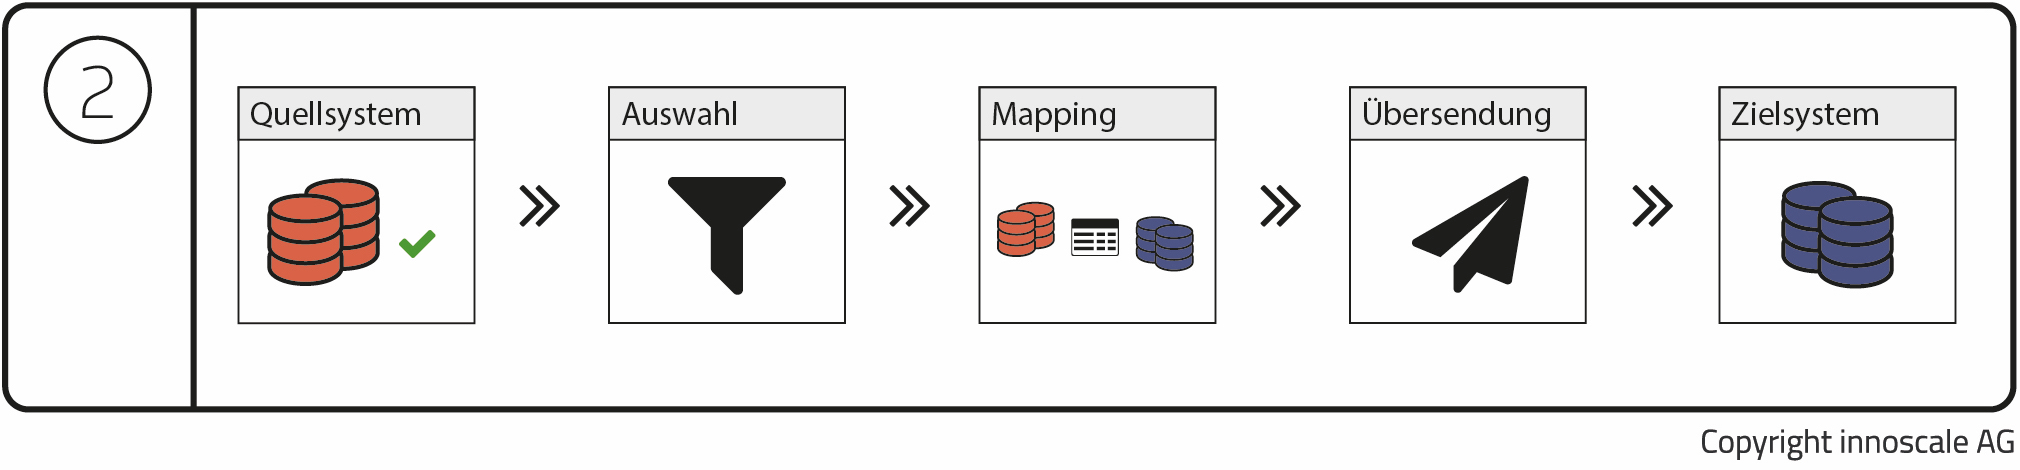 Datenmigration: Mapping in Zieldatenstruktur